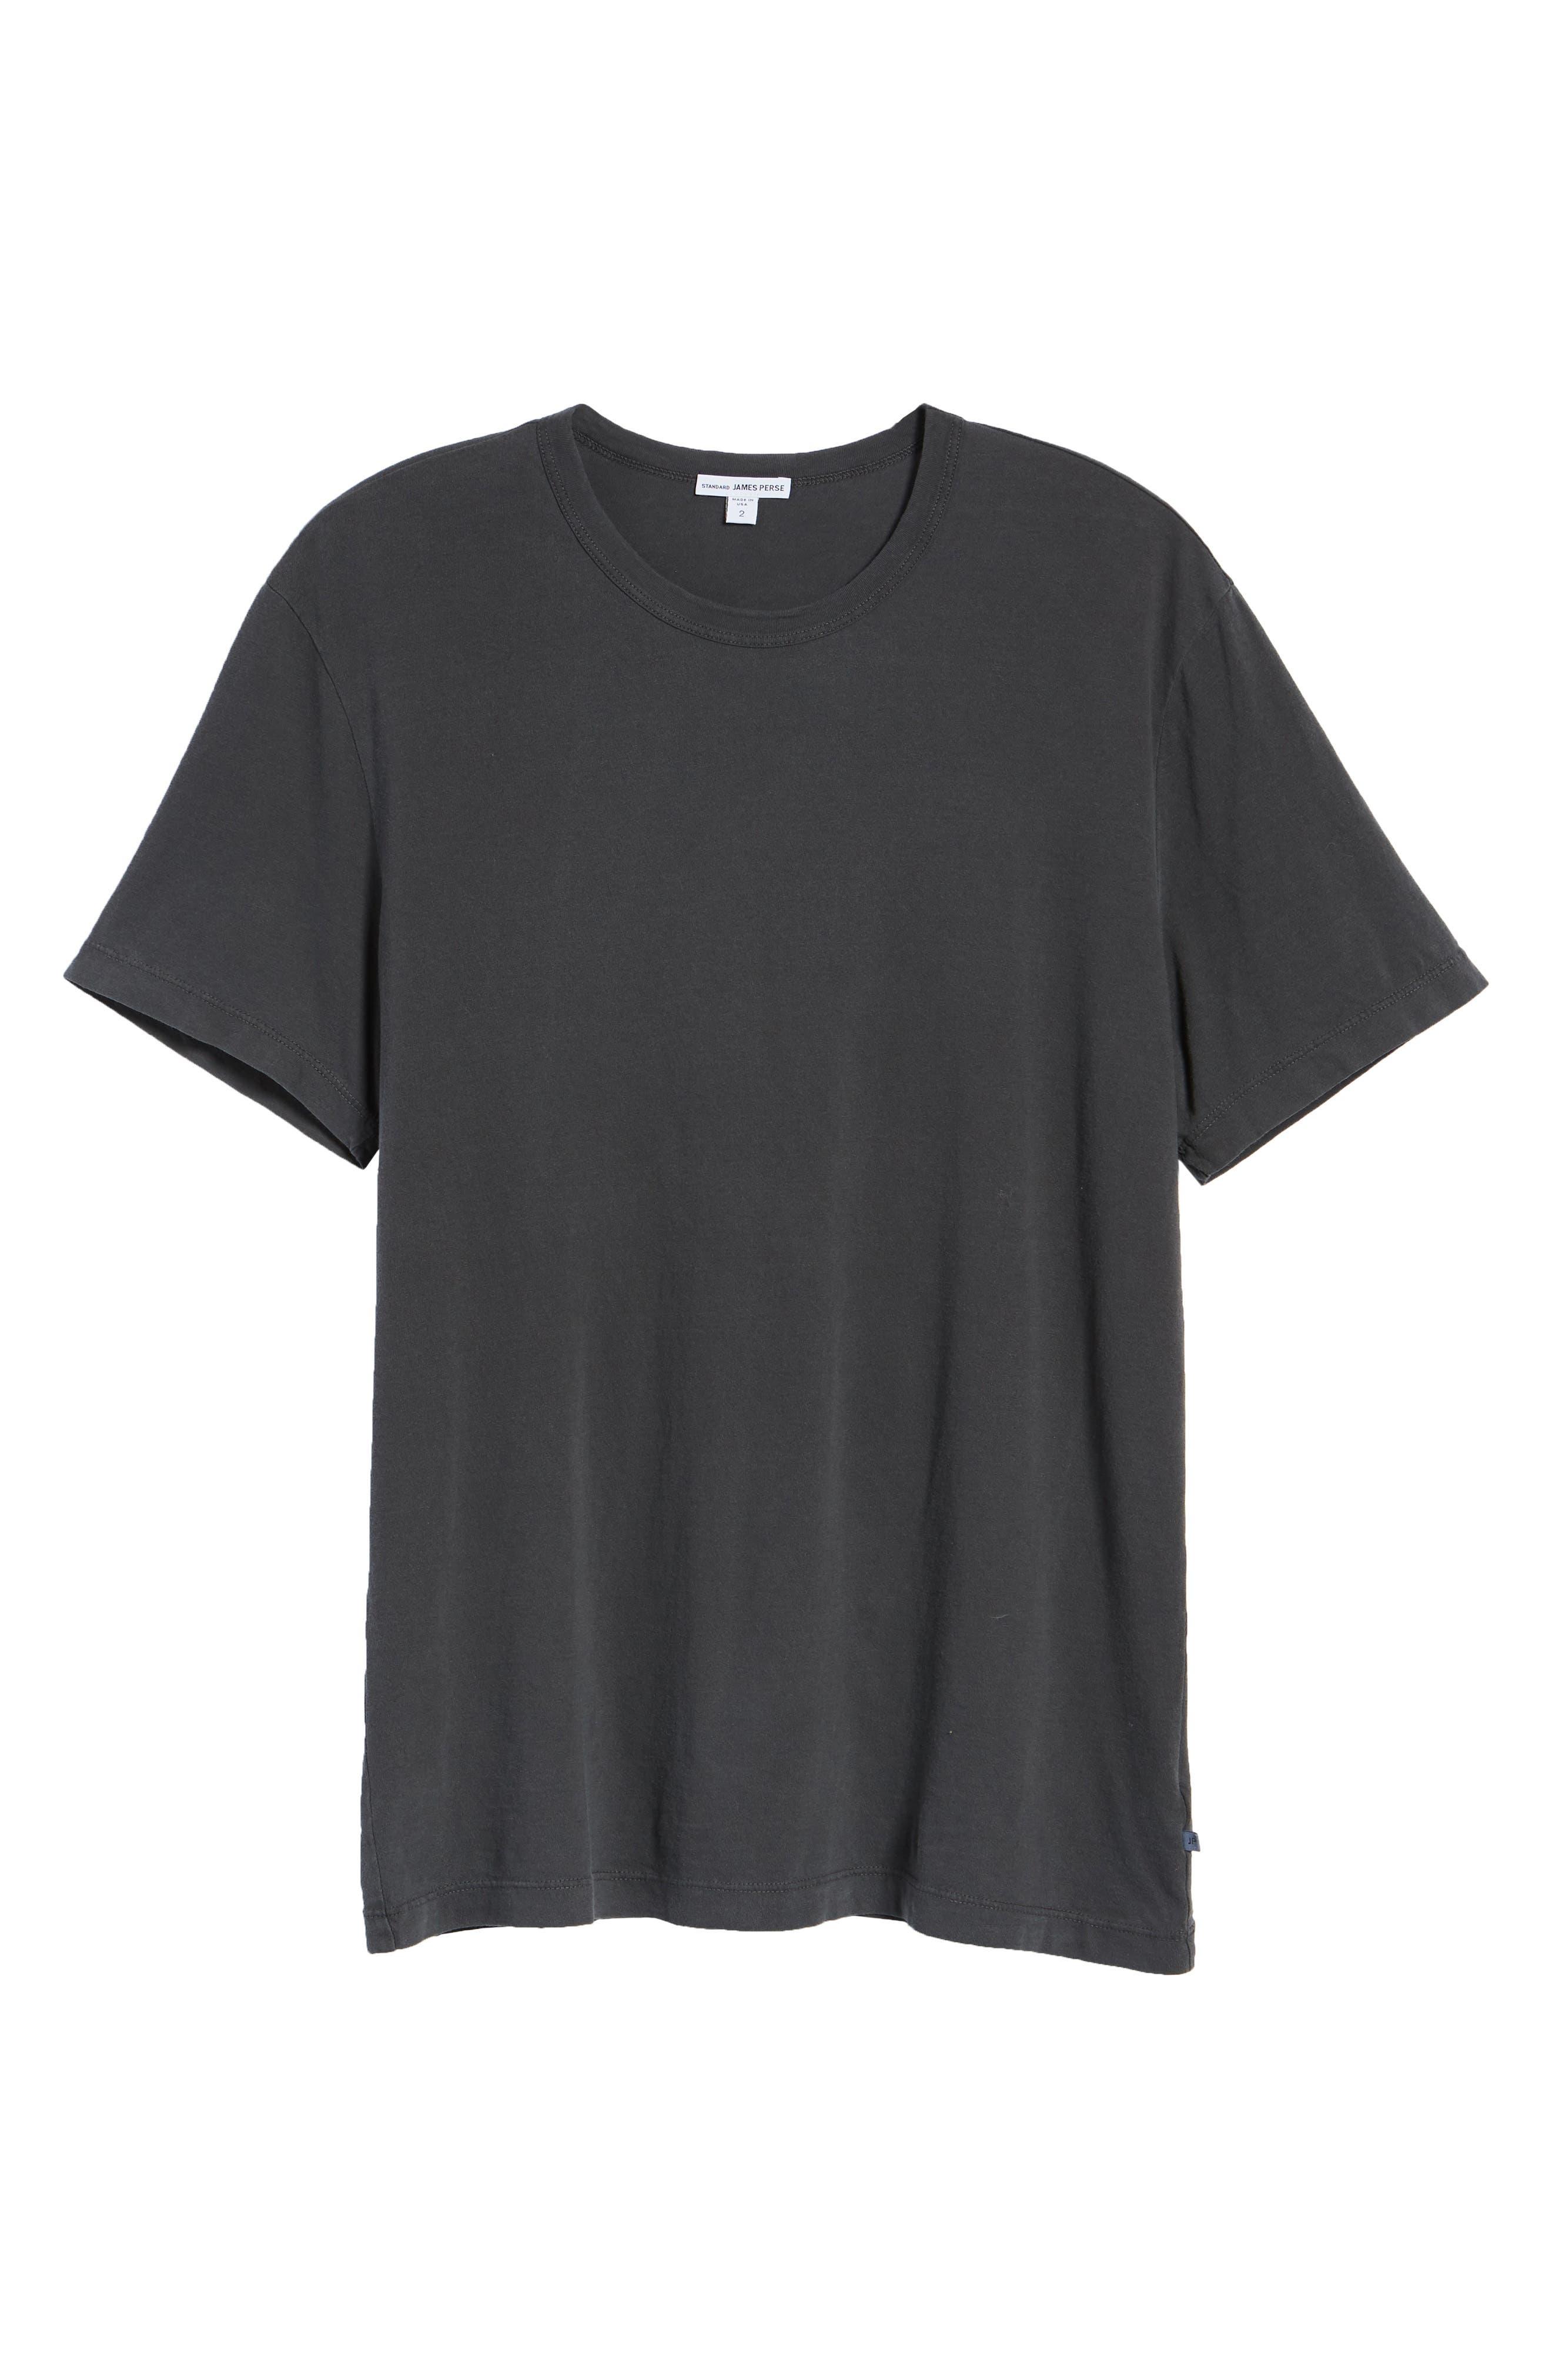 Regular Fit Tonal Palms Crewneck Shirt,                             Alternate thumbnail 6, color,                             CARBON PIGMENT